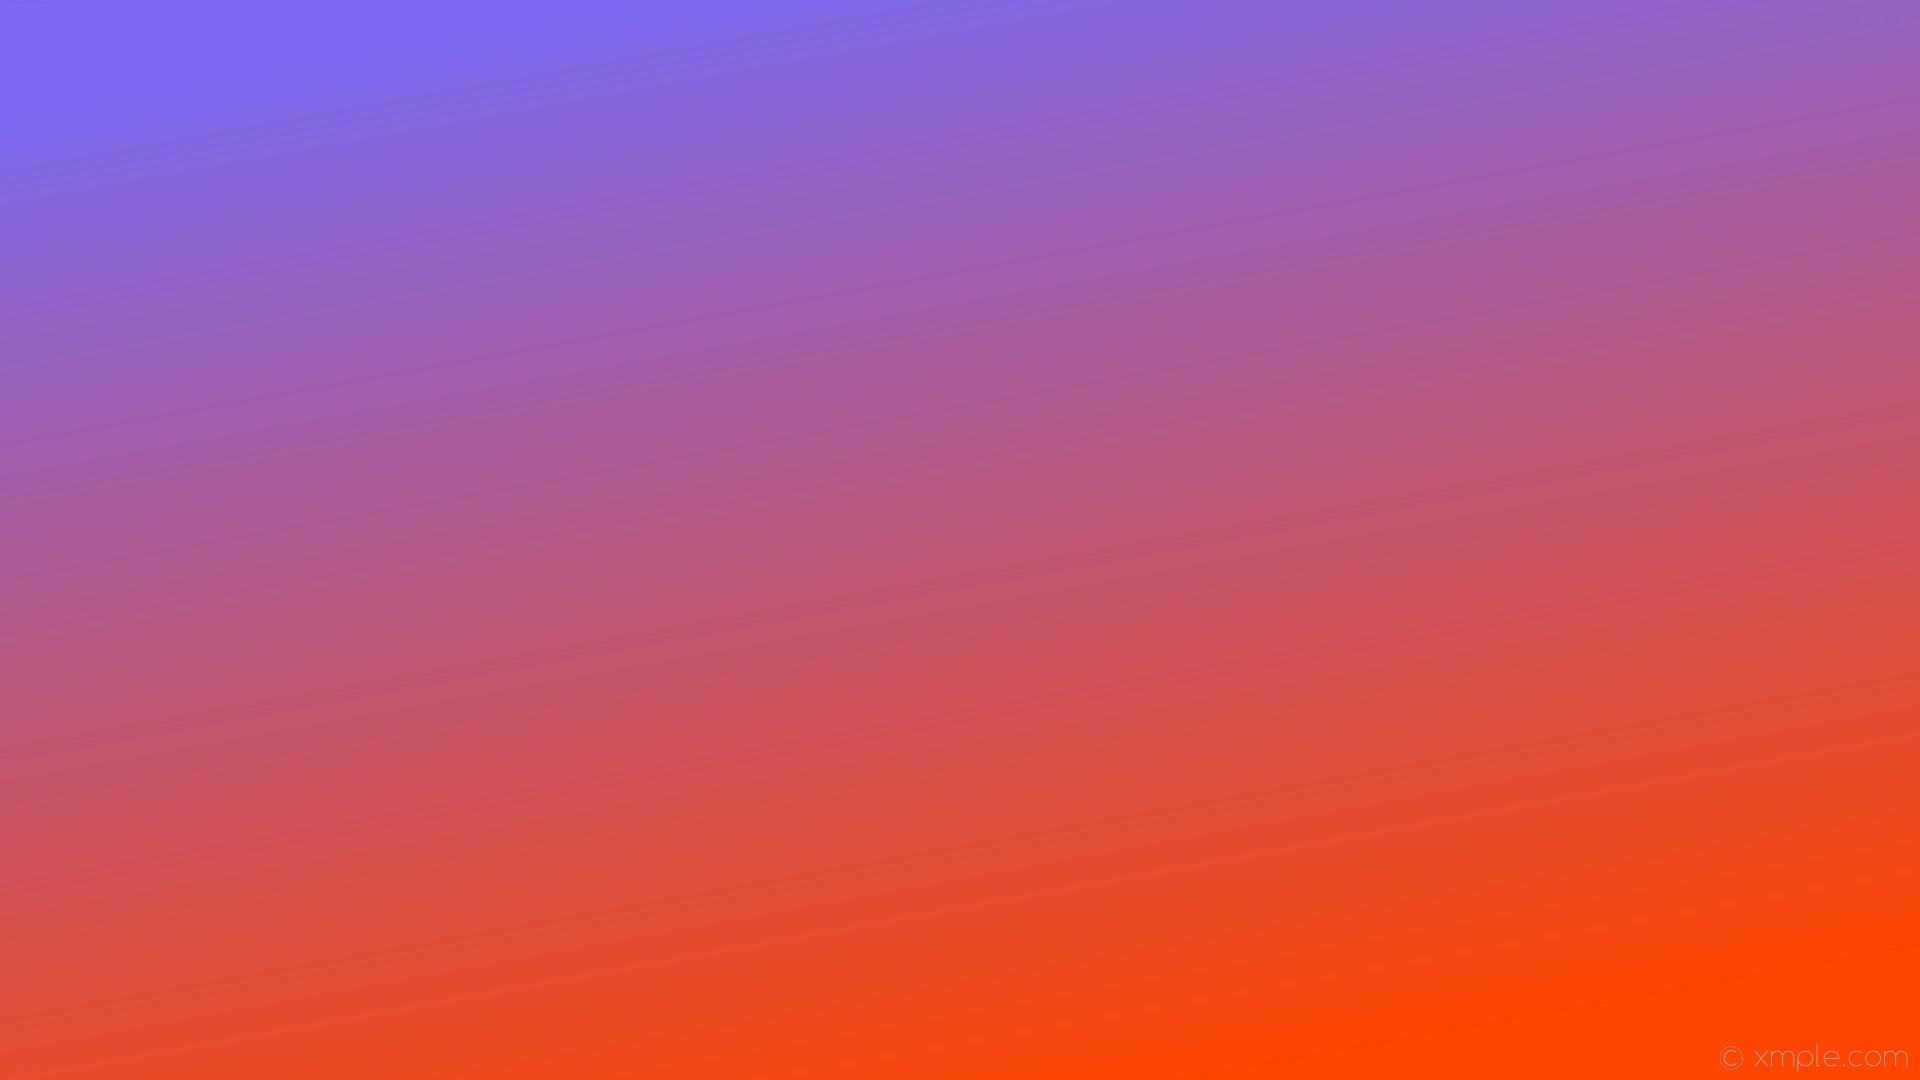 wallpaper orange purple gradient linear medium slate blue orangered #7b68ee  #ff4500 120°